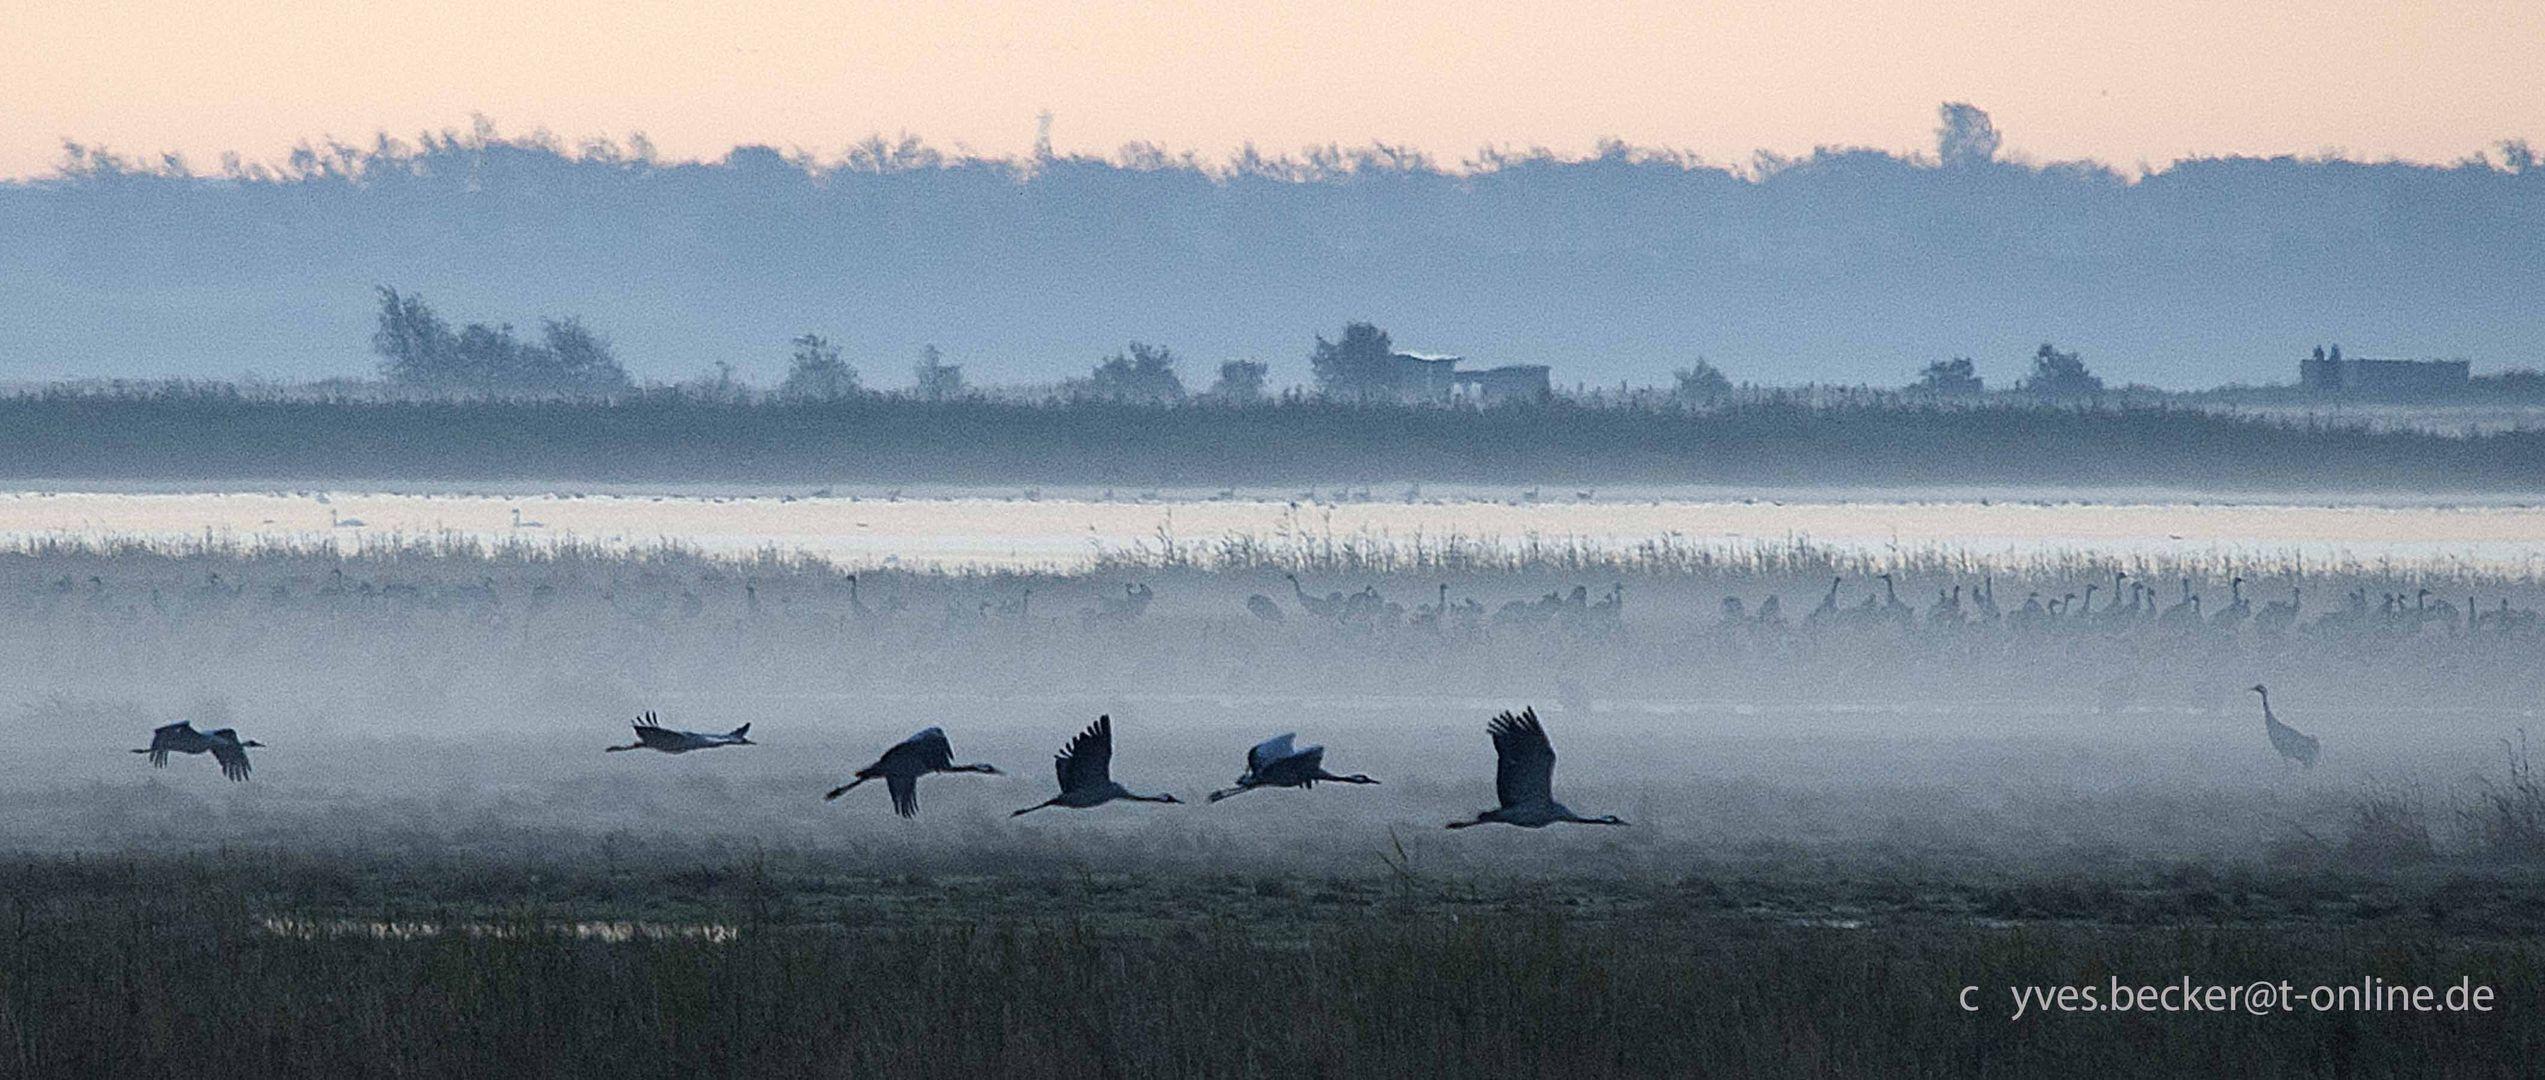 Kraniche am Darss - Morgenflug 2